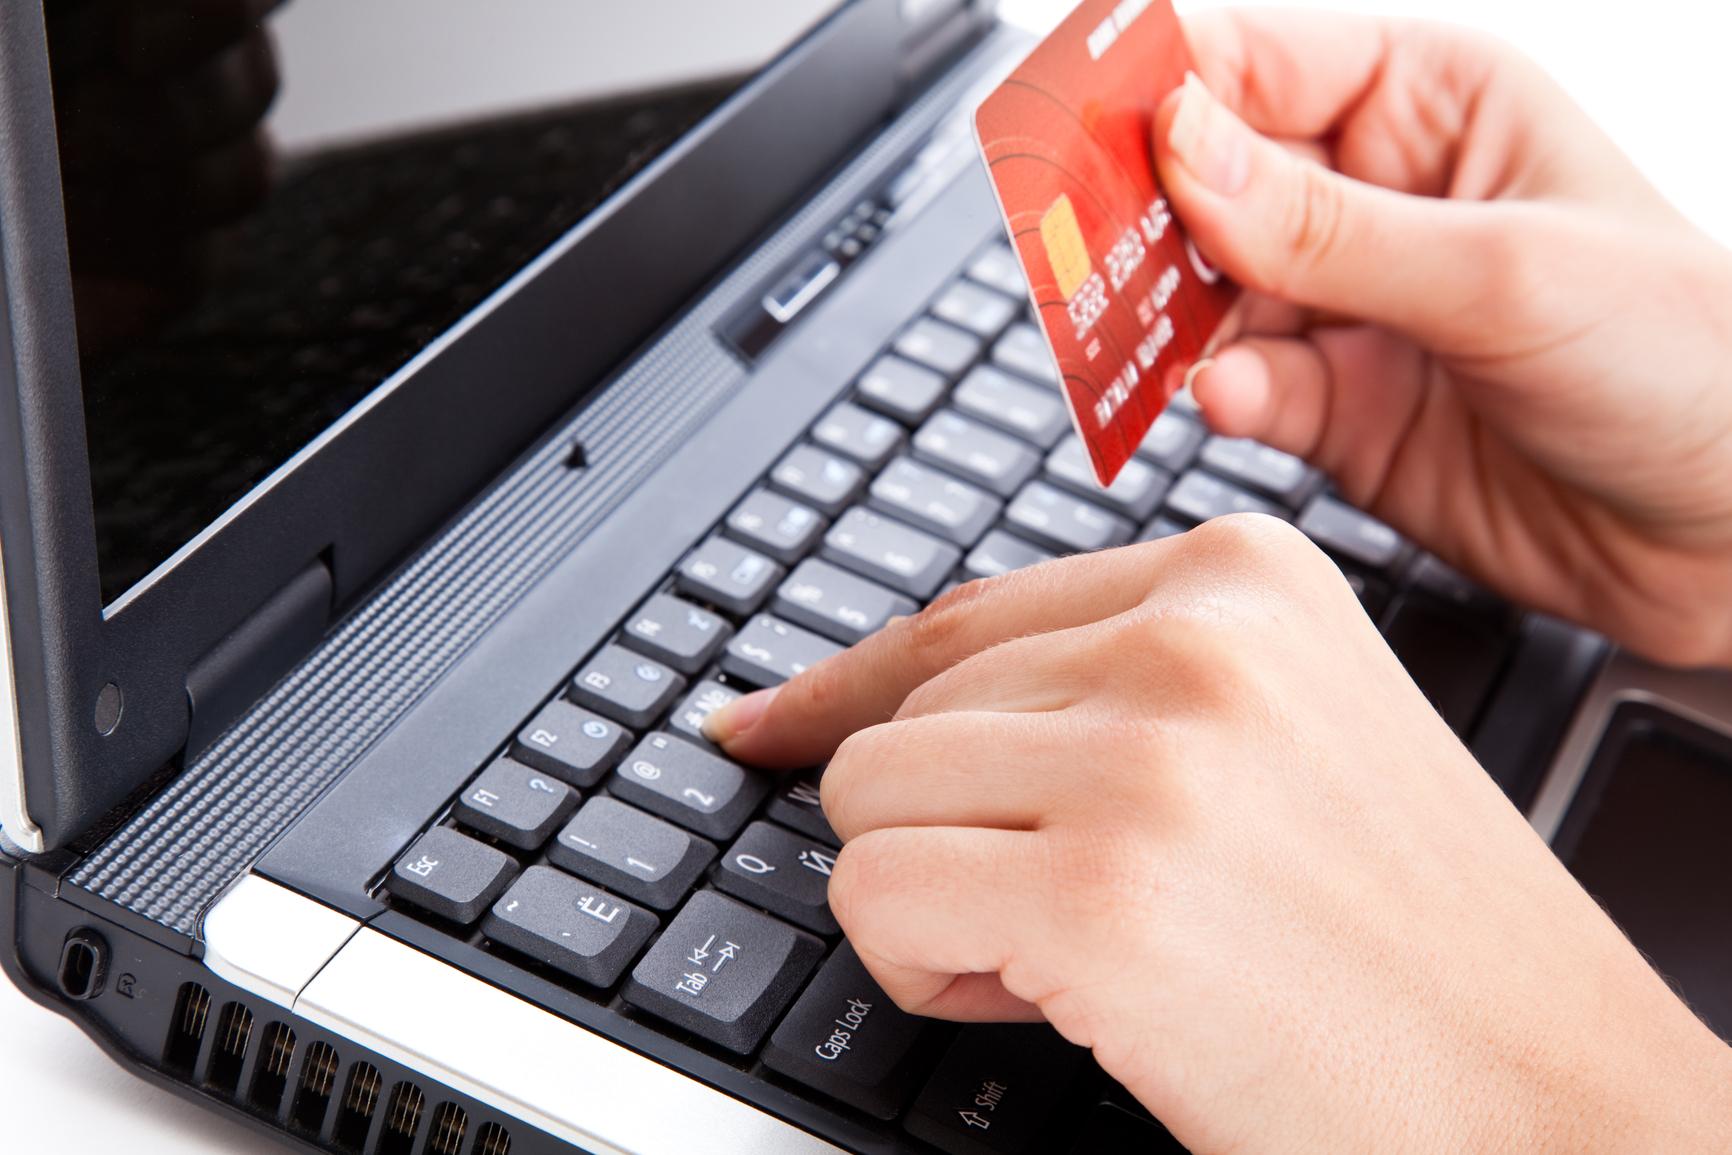 Как погасить кредит с карточки Каспи Голд через интернет